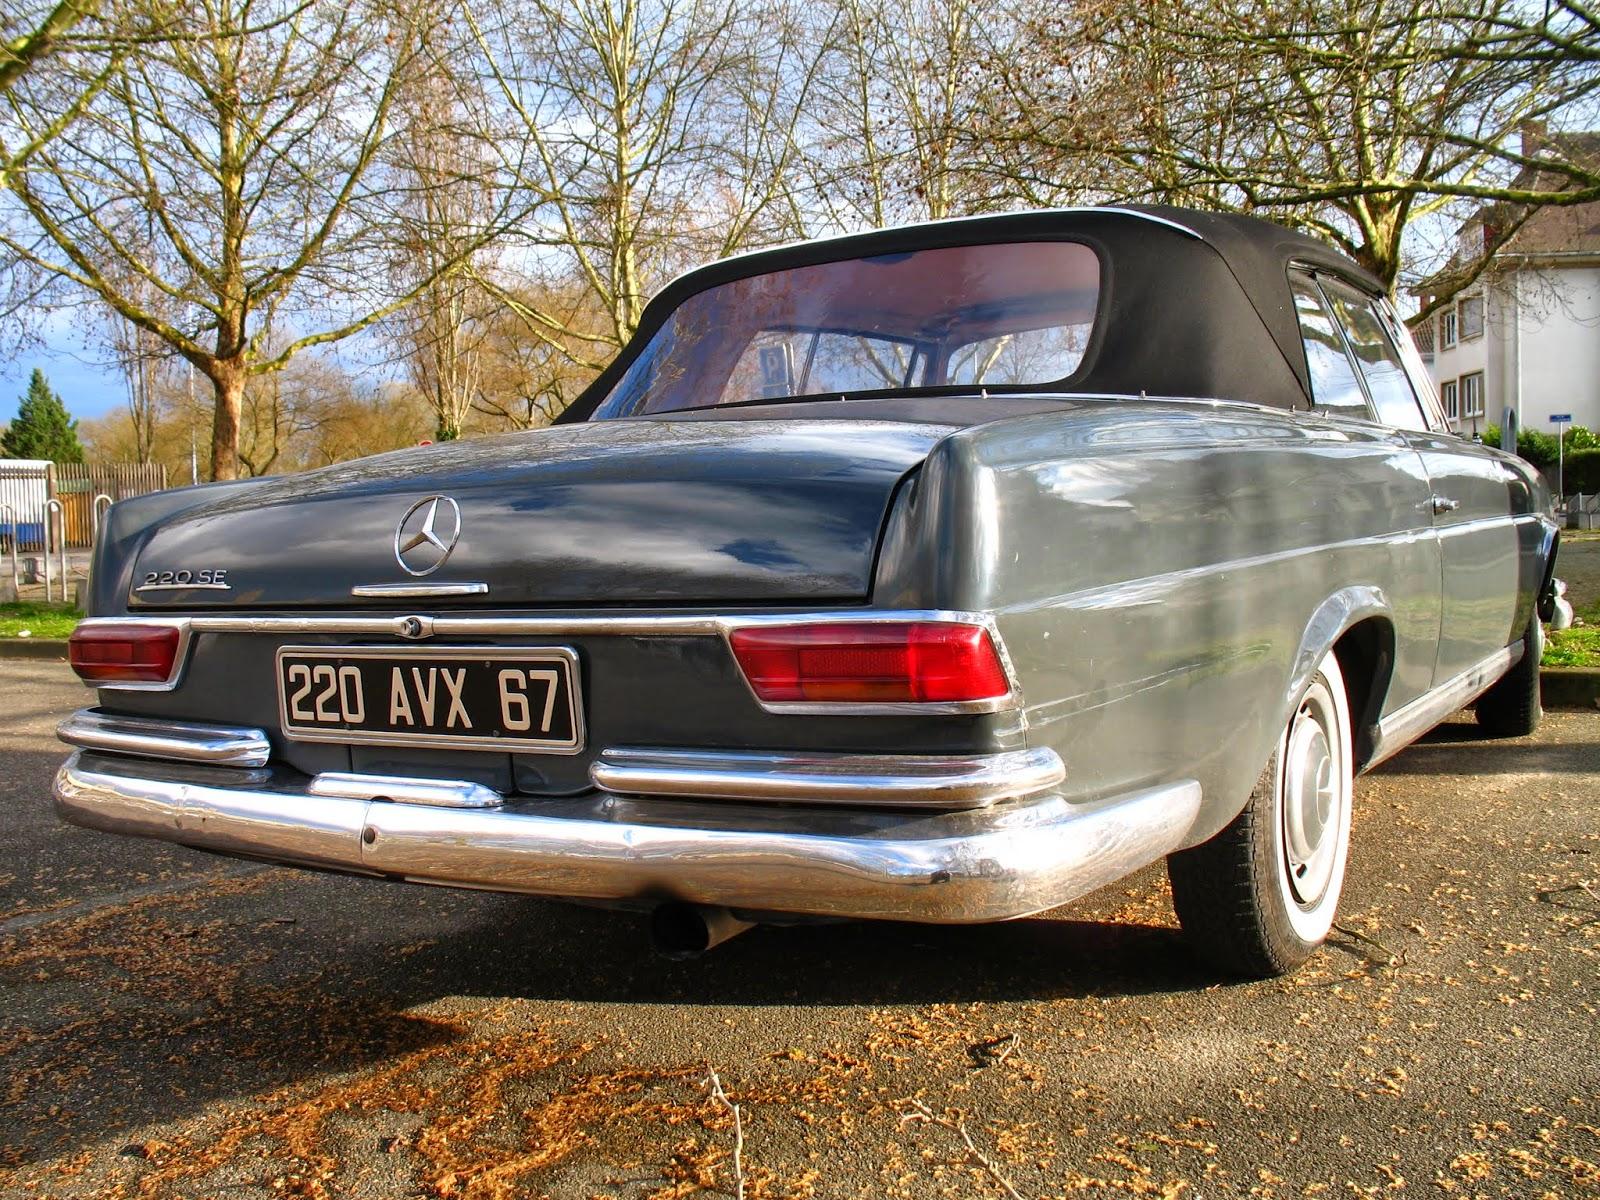 1959 1965 mercedes benz w111 220 se convertible france for Mercedes benz france